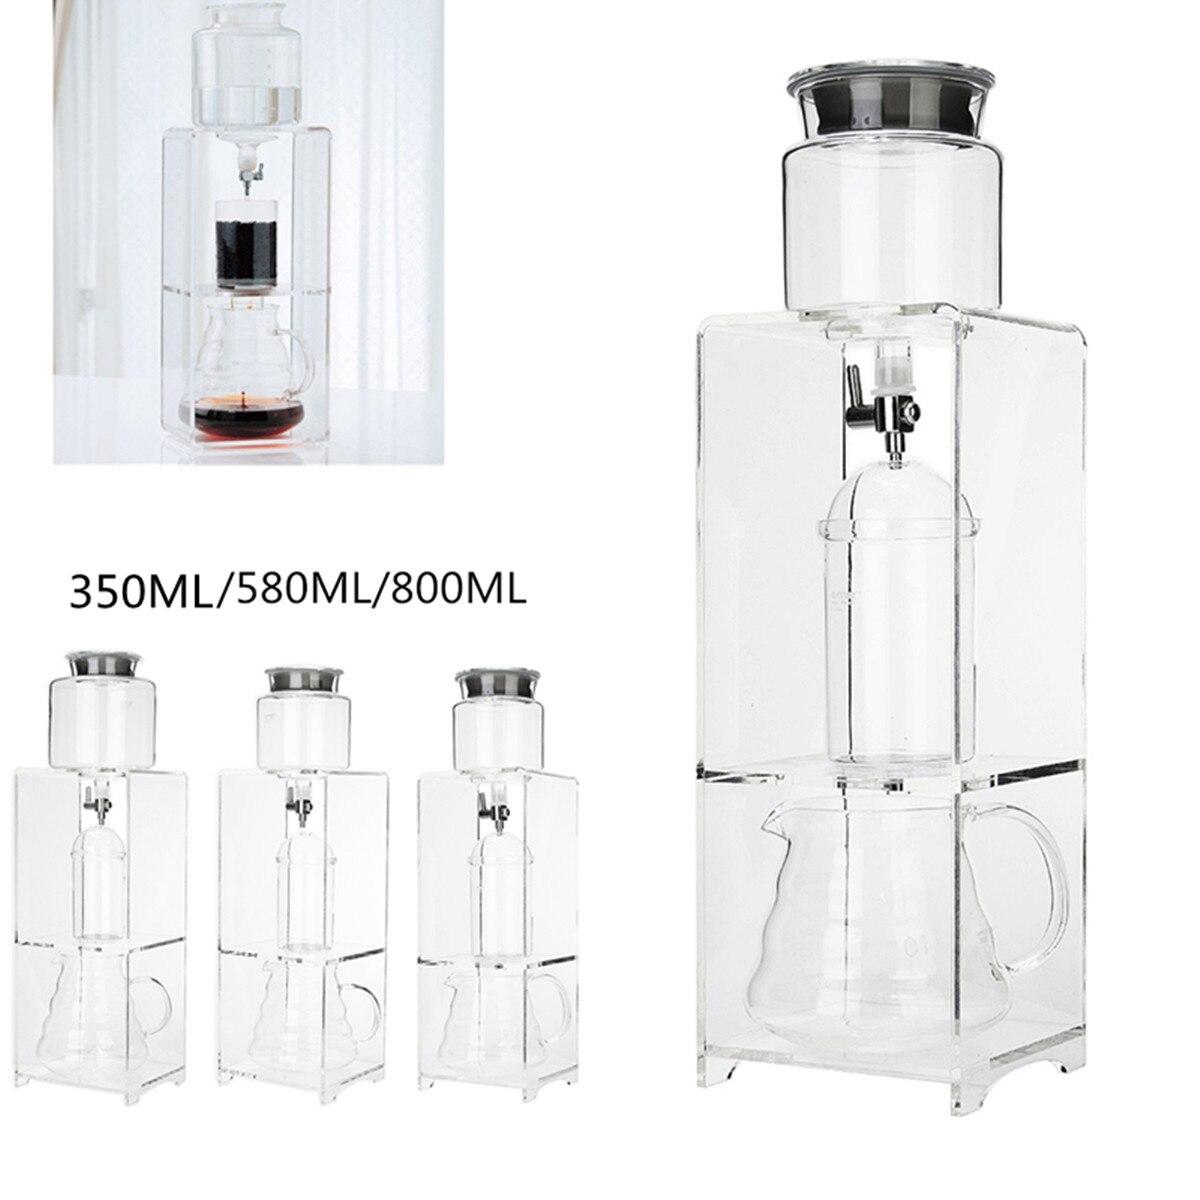 Glass Coffee Cold Drip Water Drip Coffee Maker Reusable Glass Filter  Espresso Coffee Dripper Pot Ice Cold Brew Coffee Machine